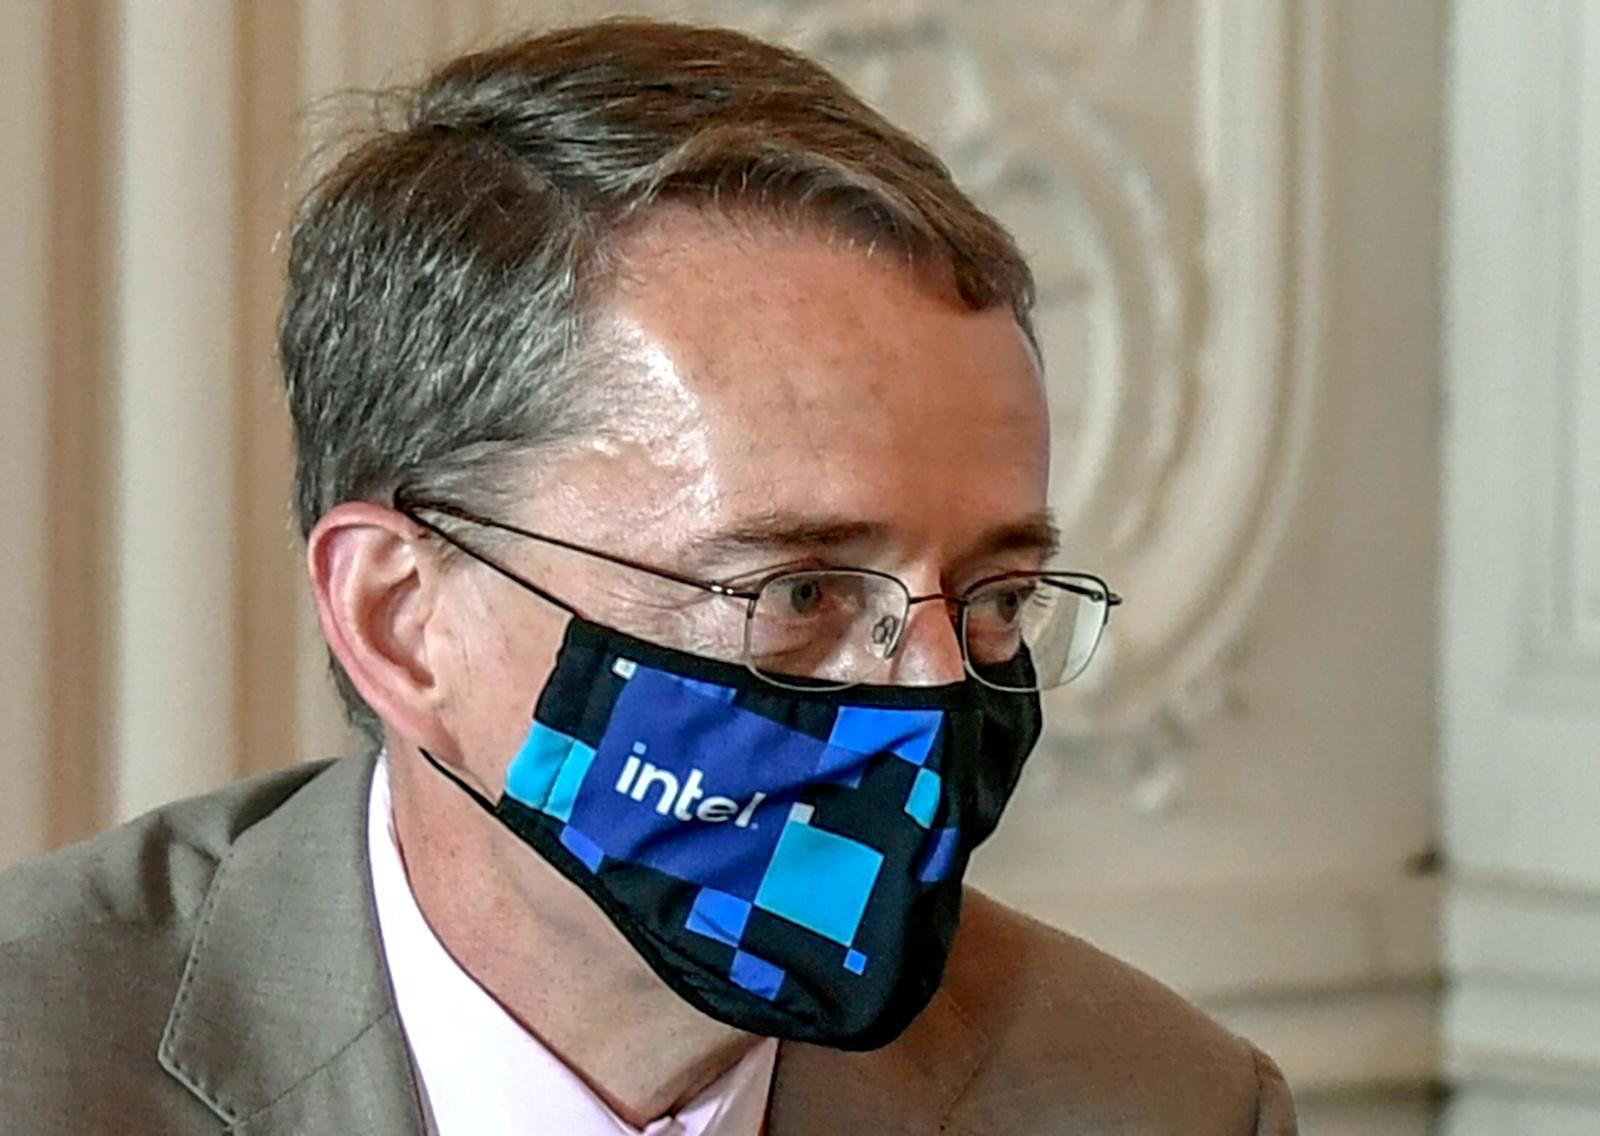 Intel CEO Pat Gelsinger attends an international business leaders' meeting in Versailles, France June 28, 2021.Stephane de Sakutin/Pool via REUTERS/File Photo